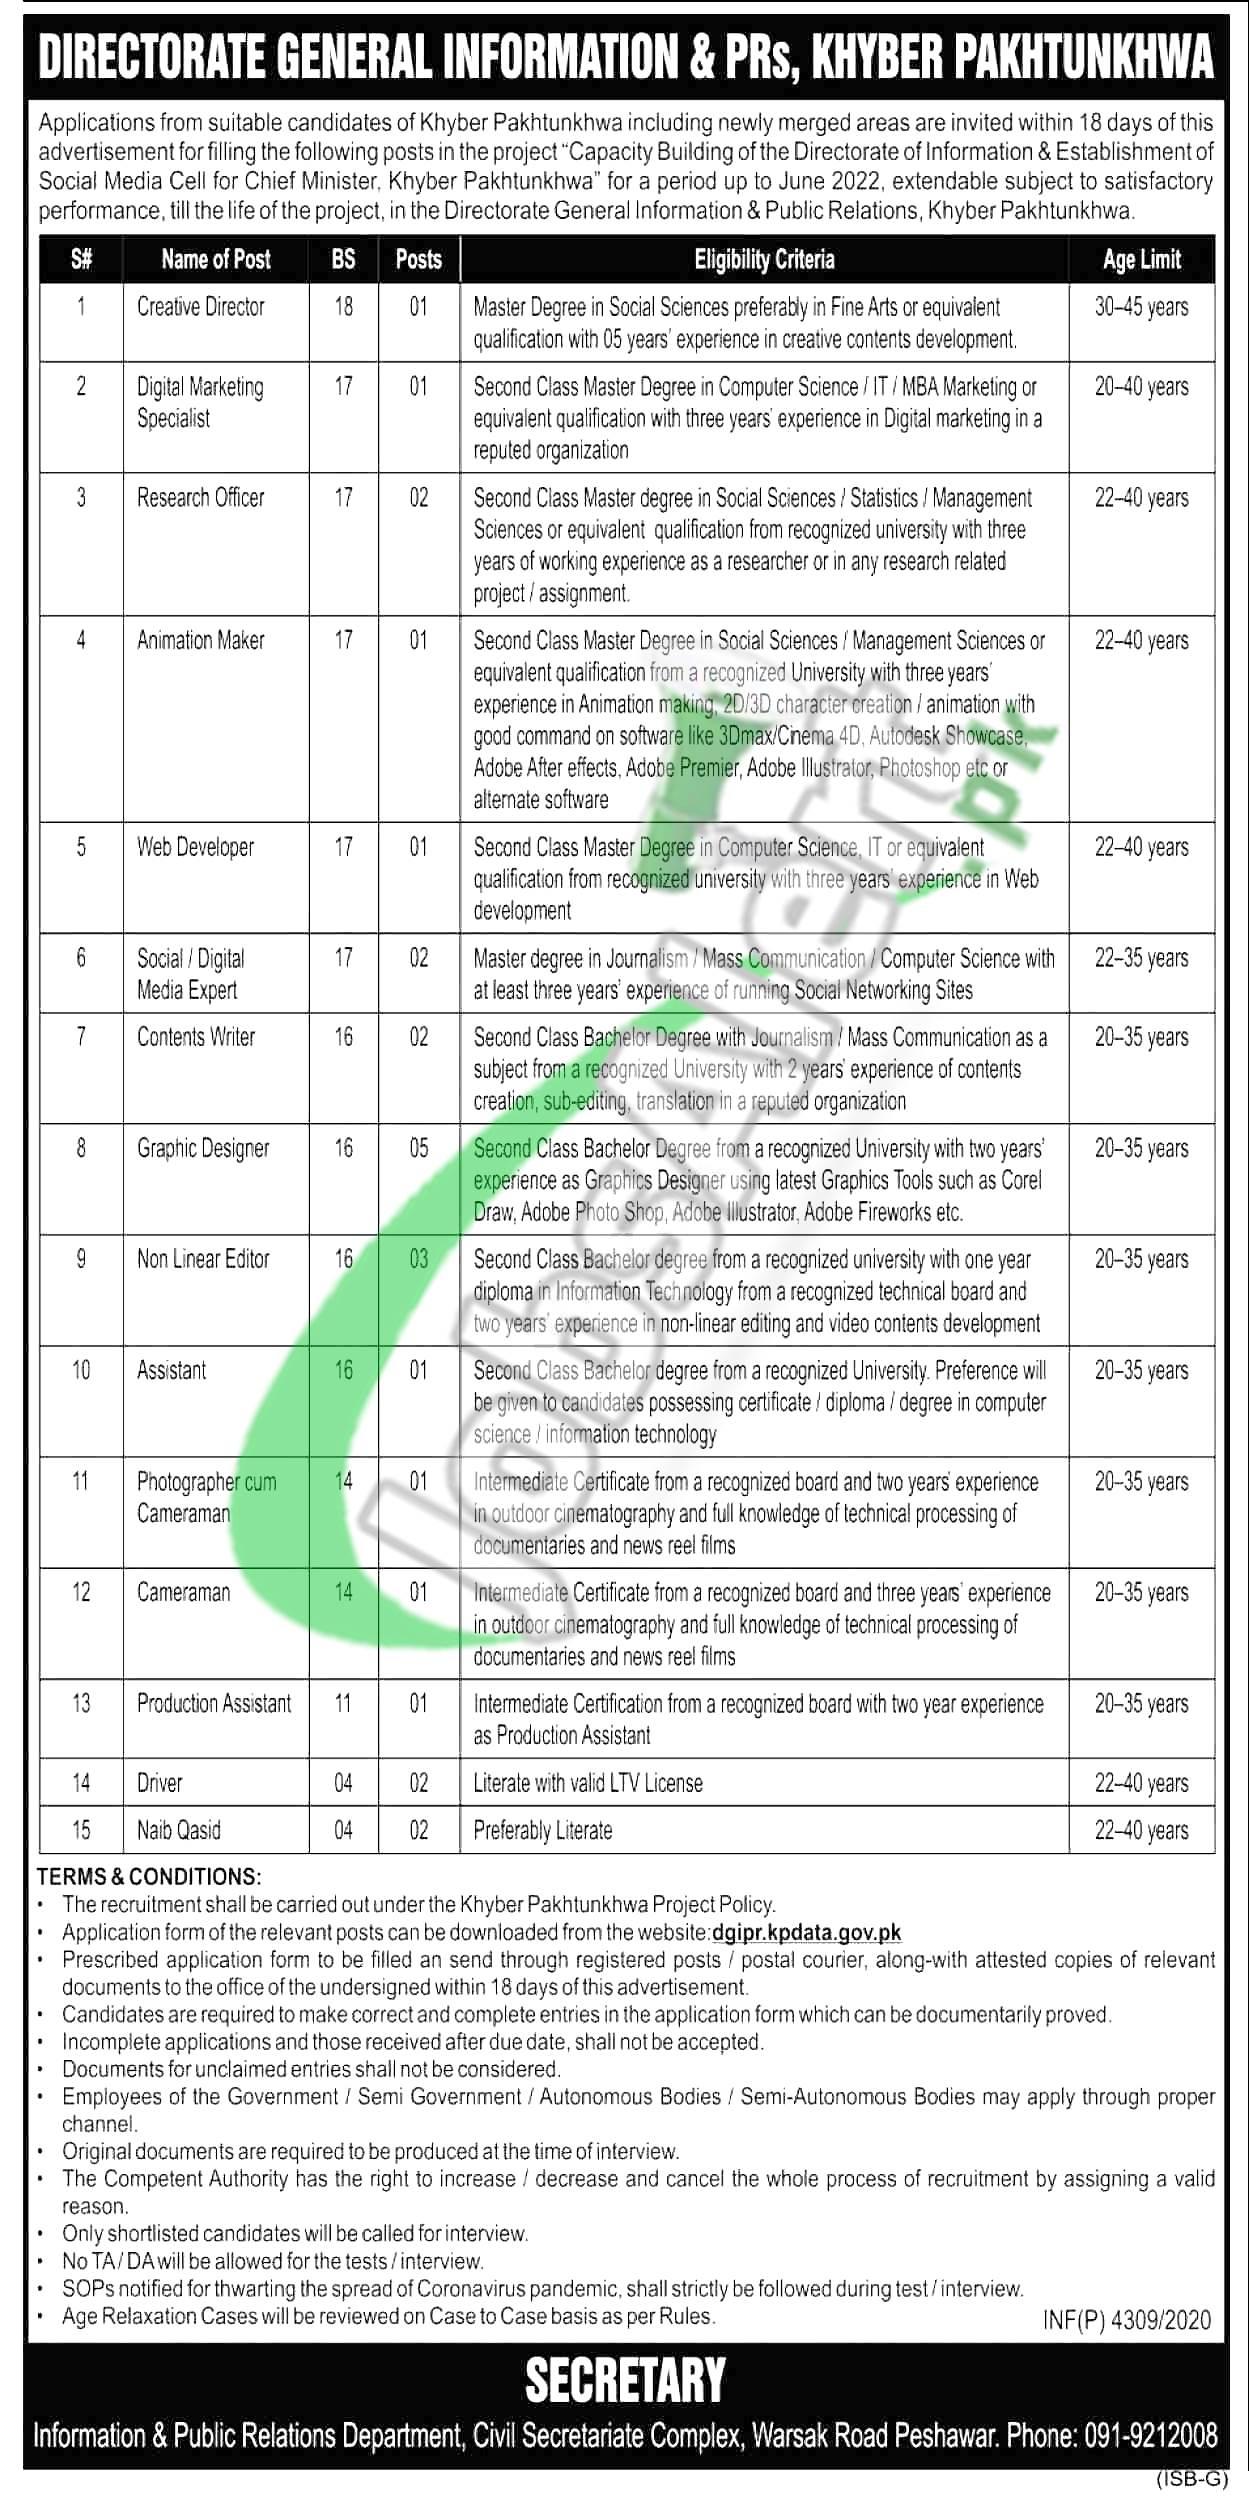 Information and Public Relation Department KPK Jobs